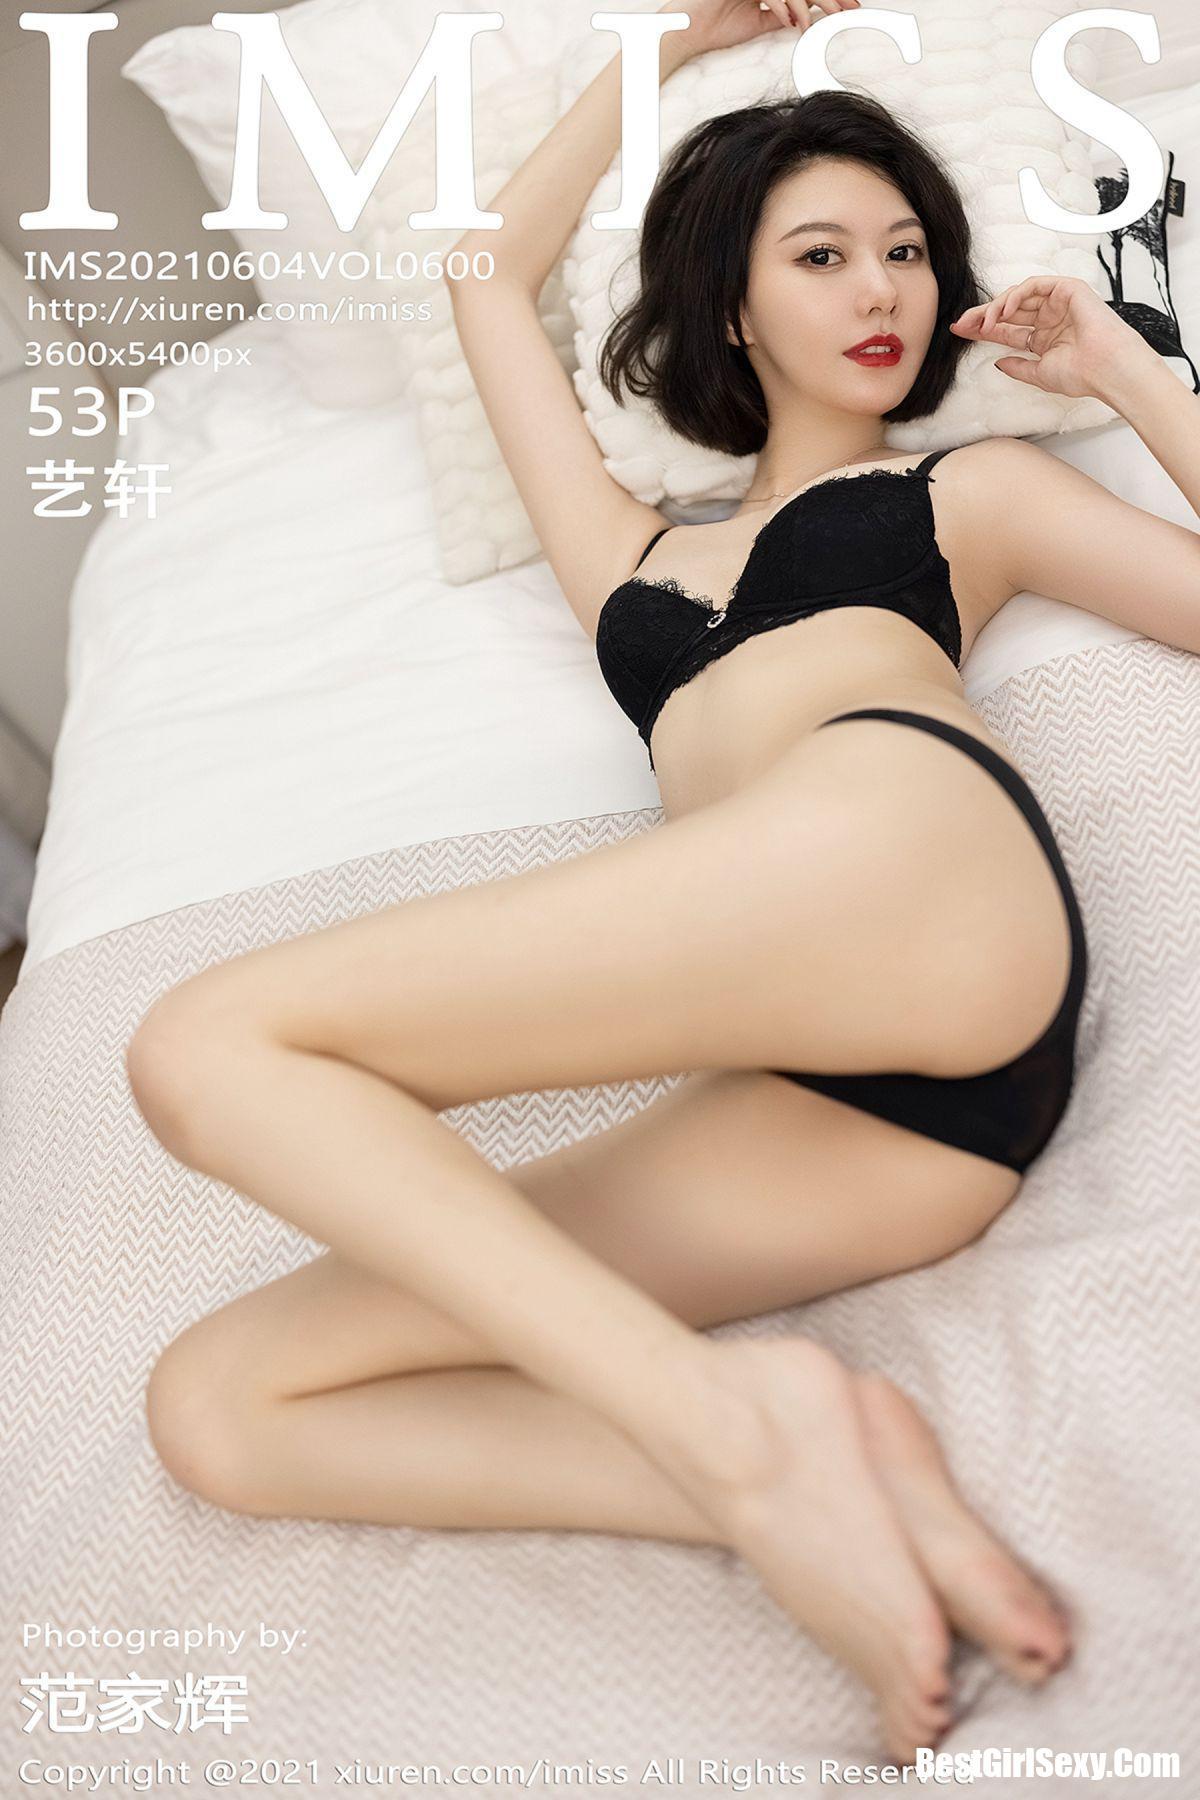 IMiss爱蜜社 Vol.600 Fu Yi Xuan 1